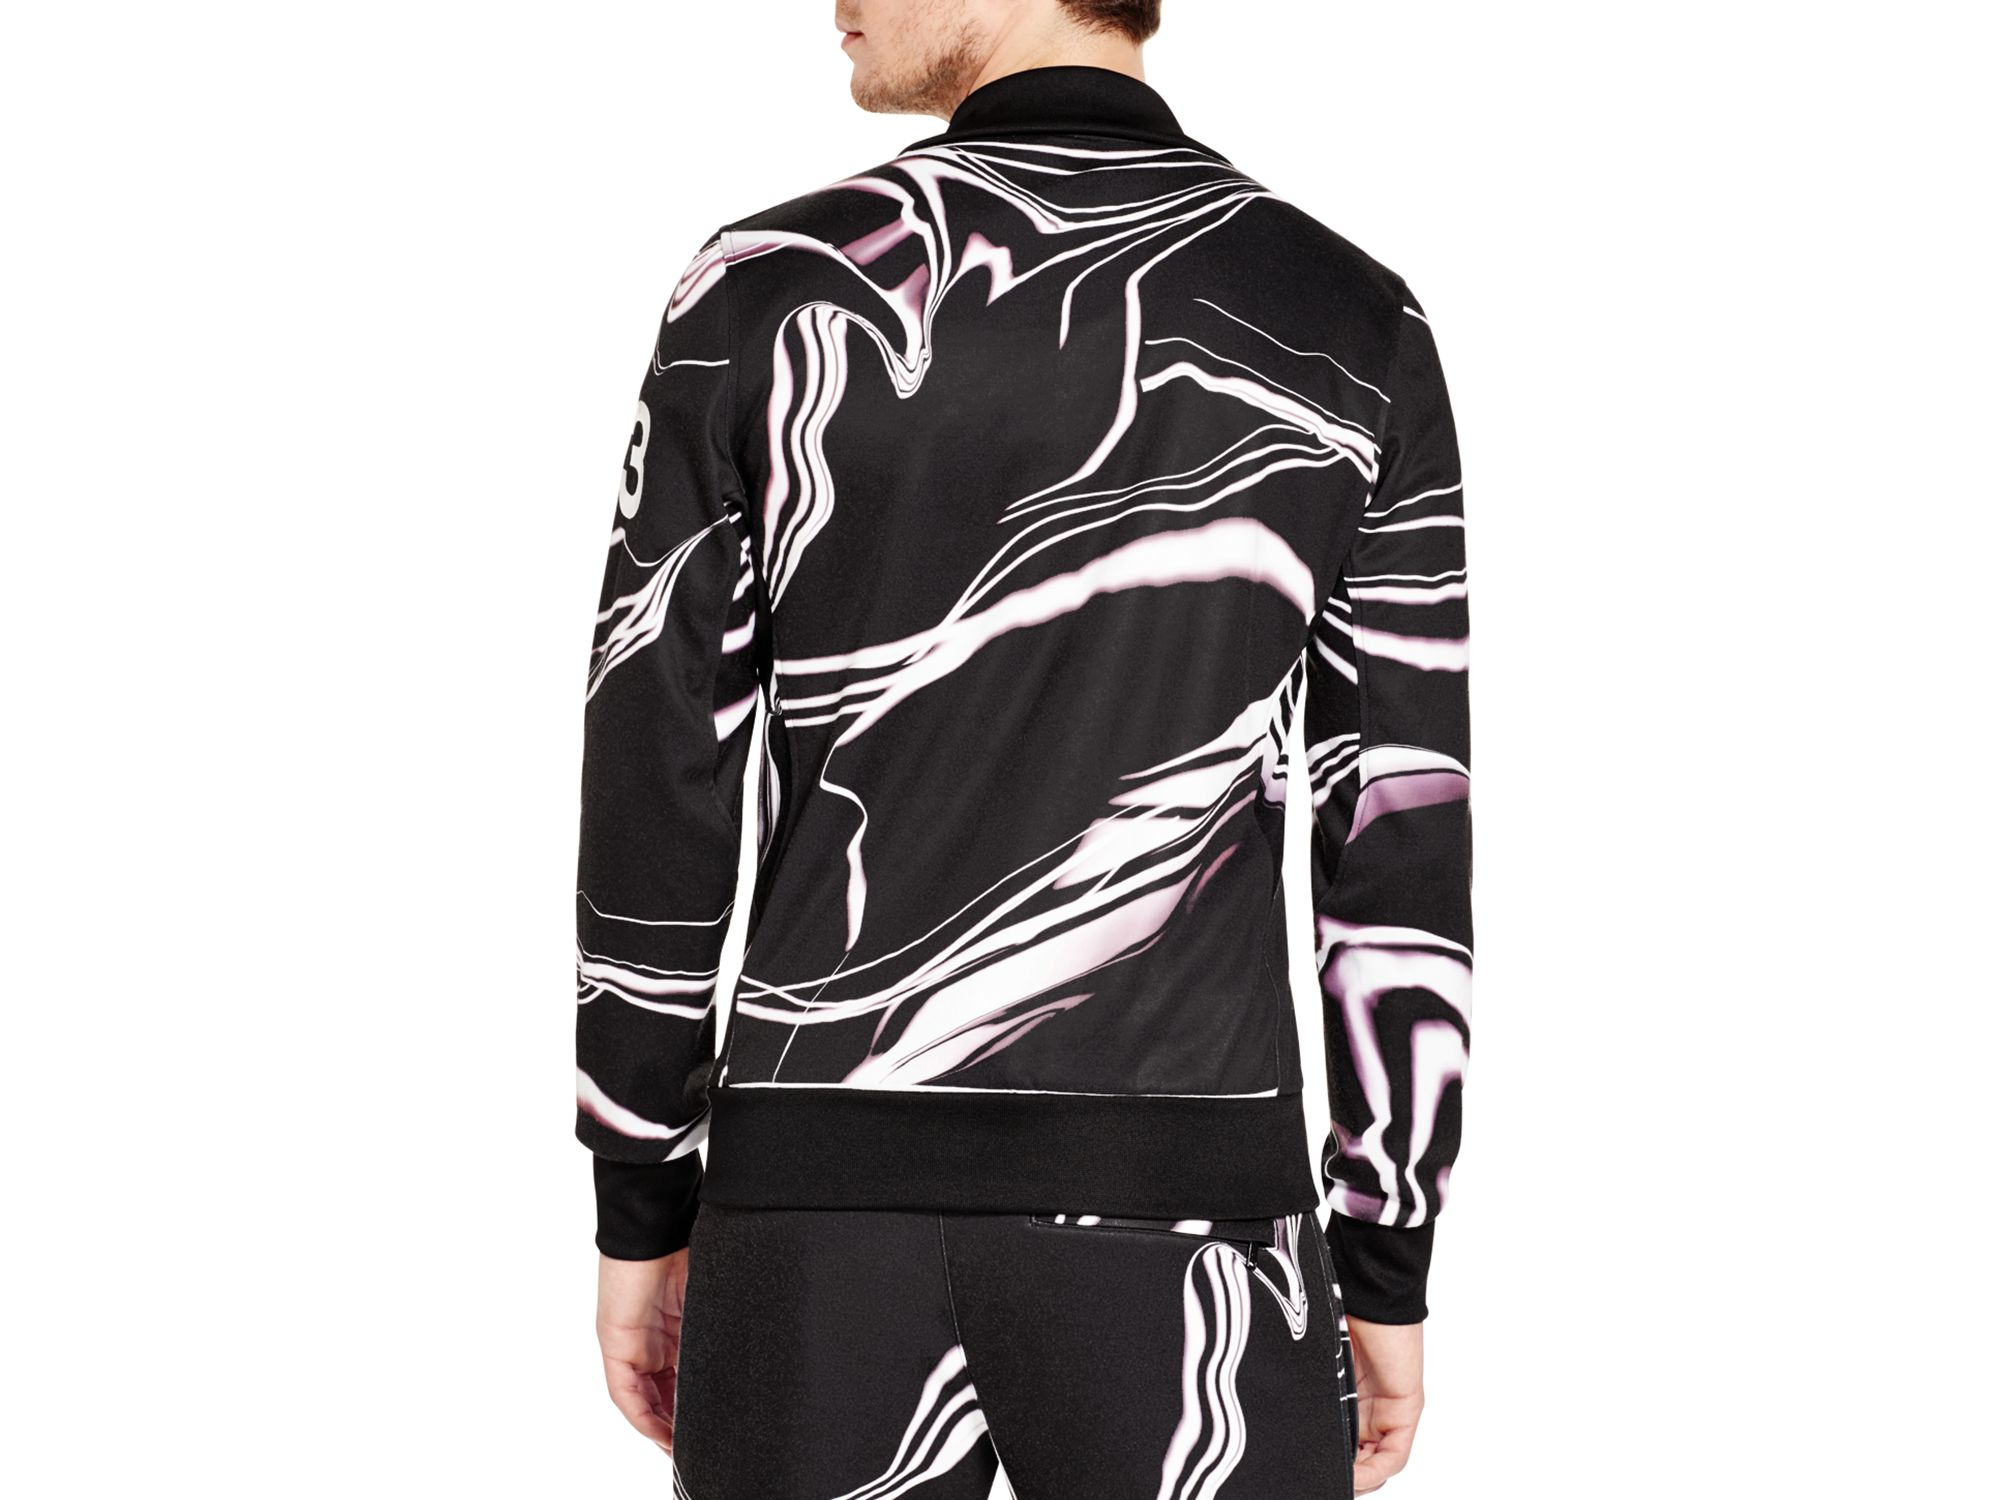 Y-3 Cotton Lightning Classic Track Jacket for Men